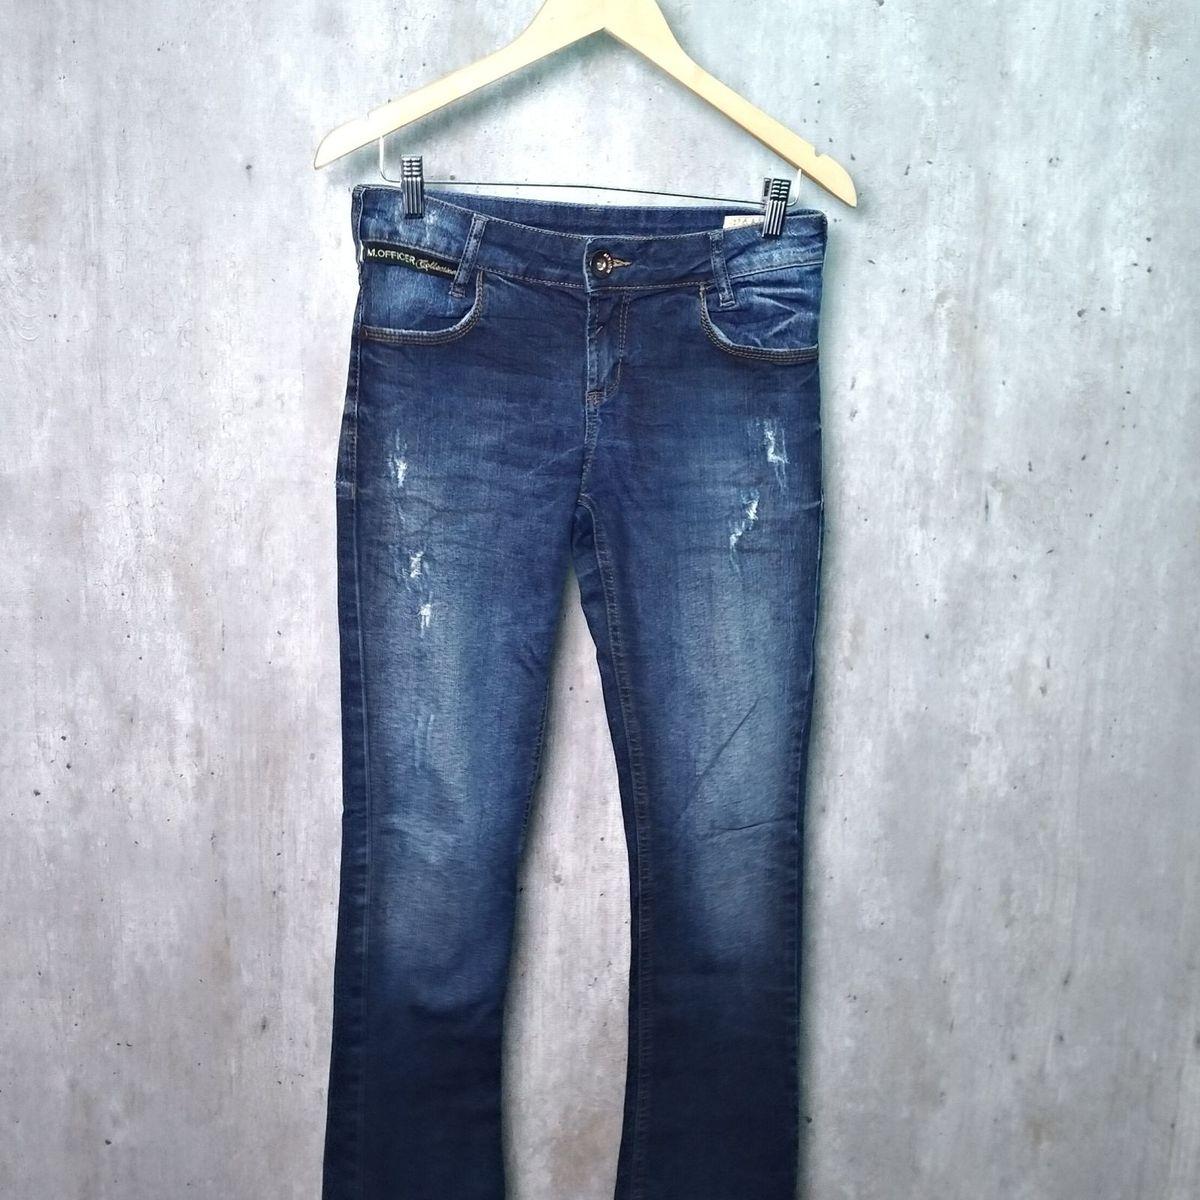 efc958617 Jeans Officer | Calça Feminina M. Officer Usado 28670407 | enjoei